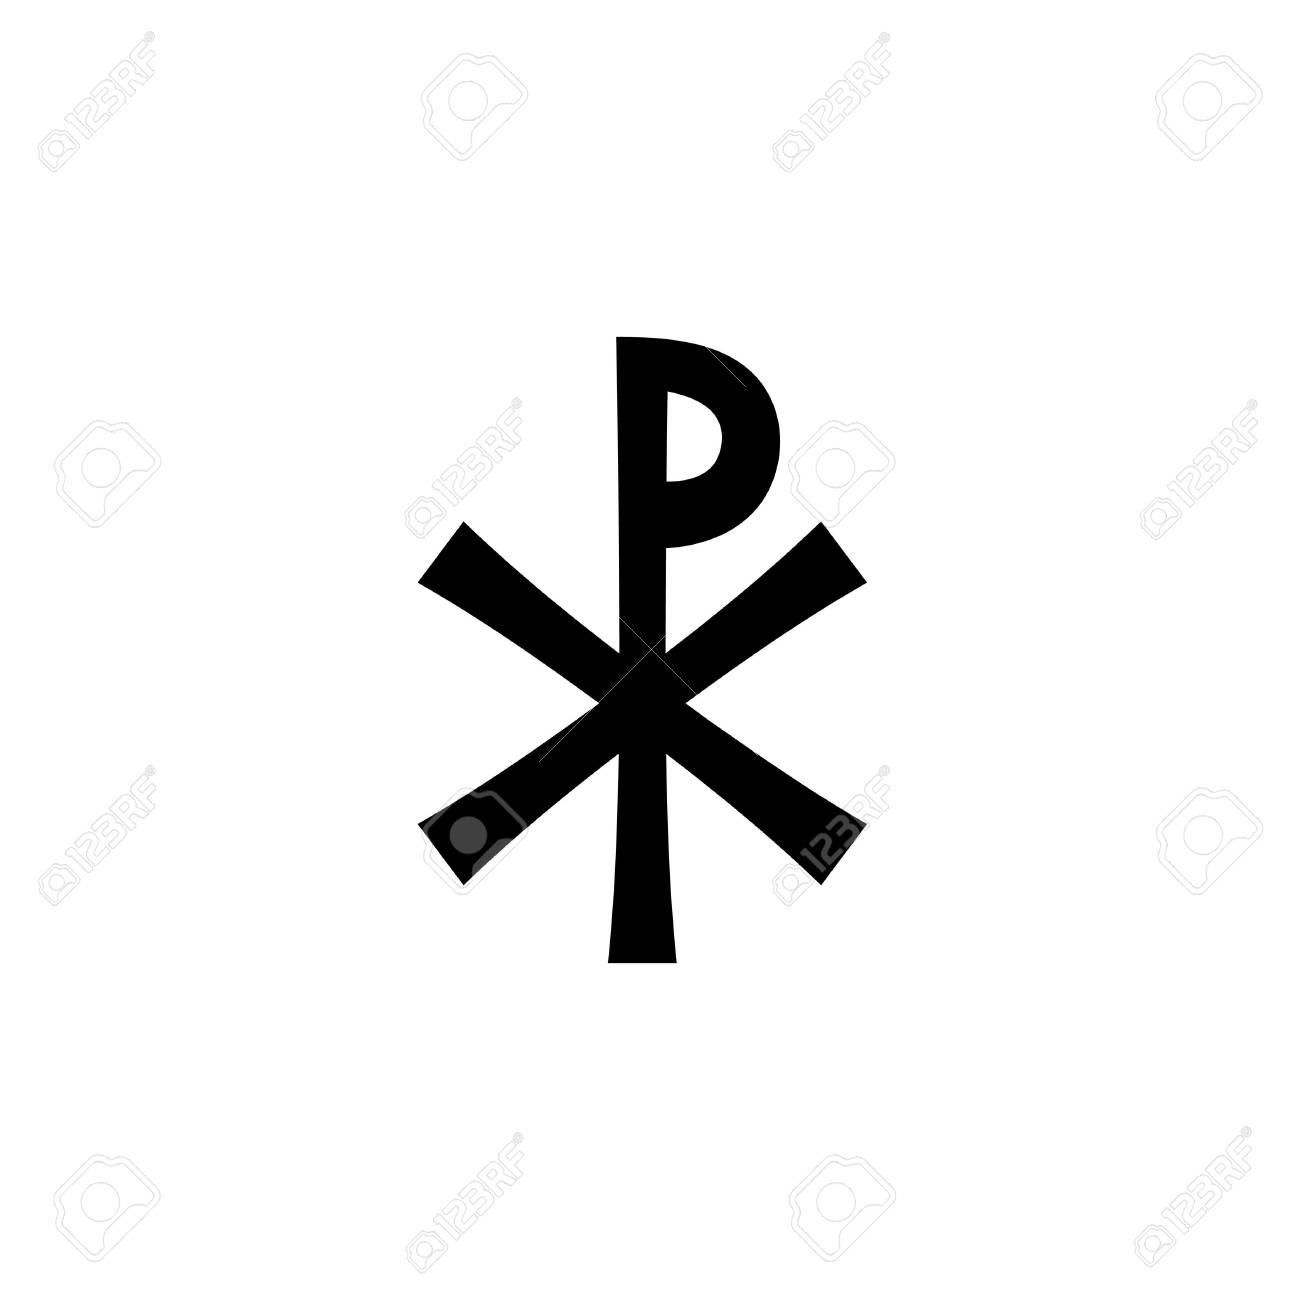 Christogram Christian Monogram Of Jesus Christ The Savior The